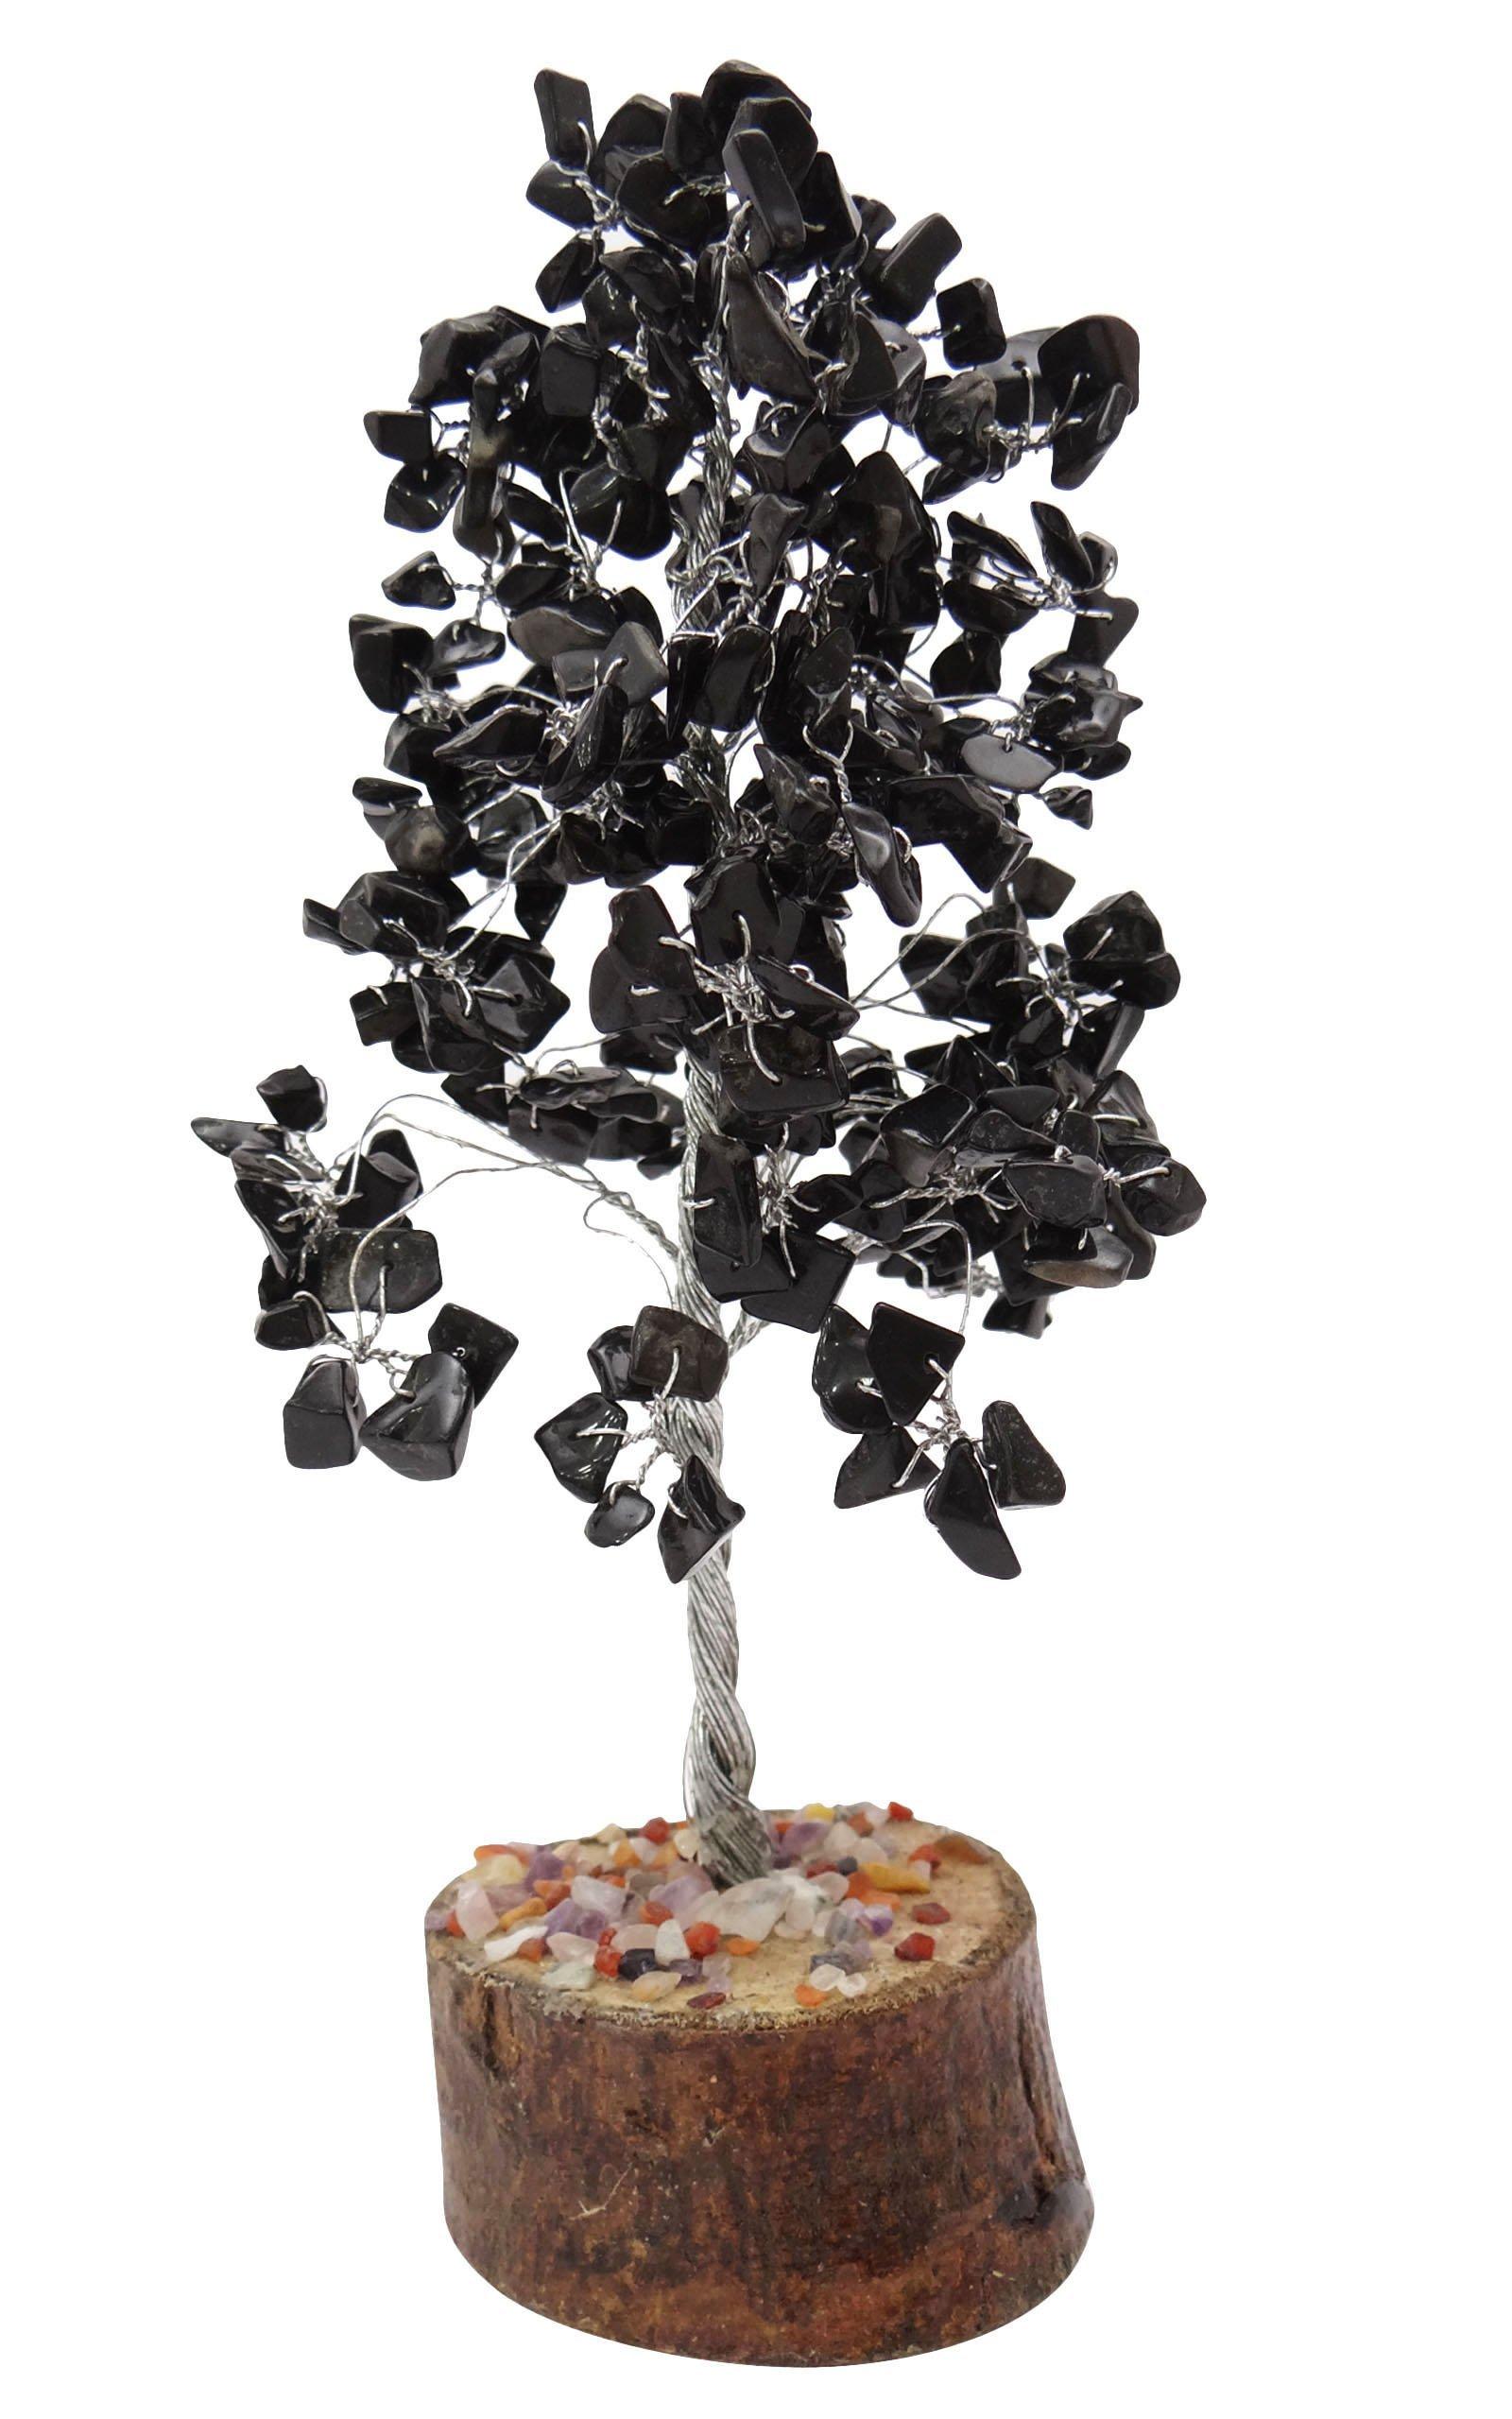 HARMONIZE Tourmaline Tree Spiritual Feng Shui Reiki Healing Stone Table Decor